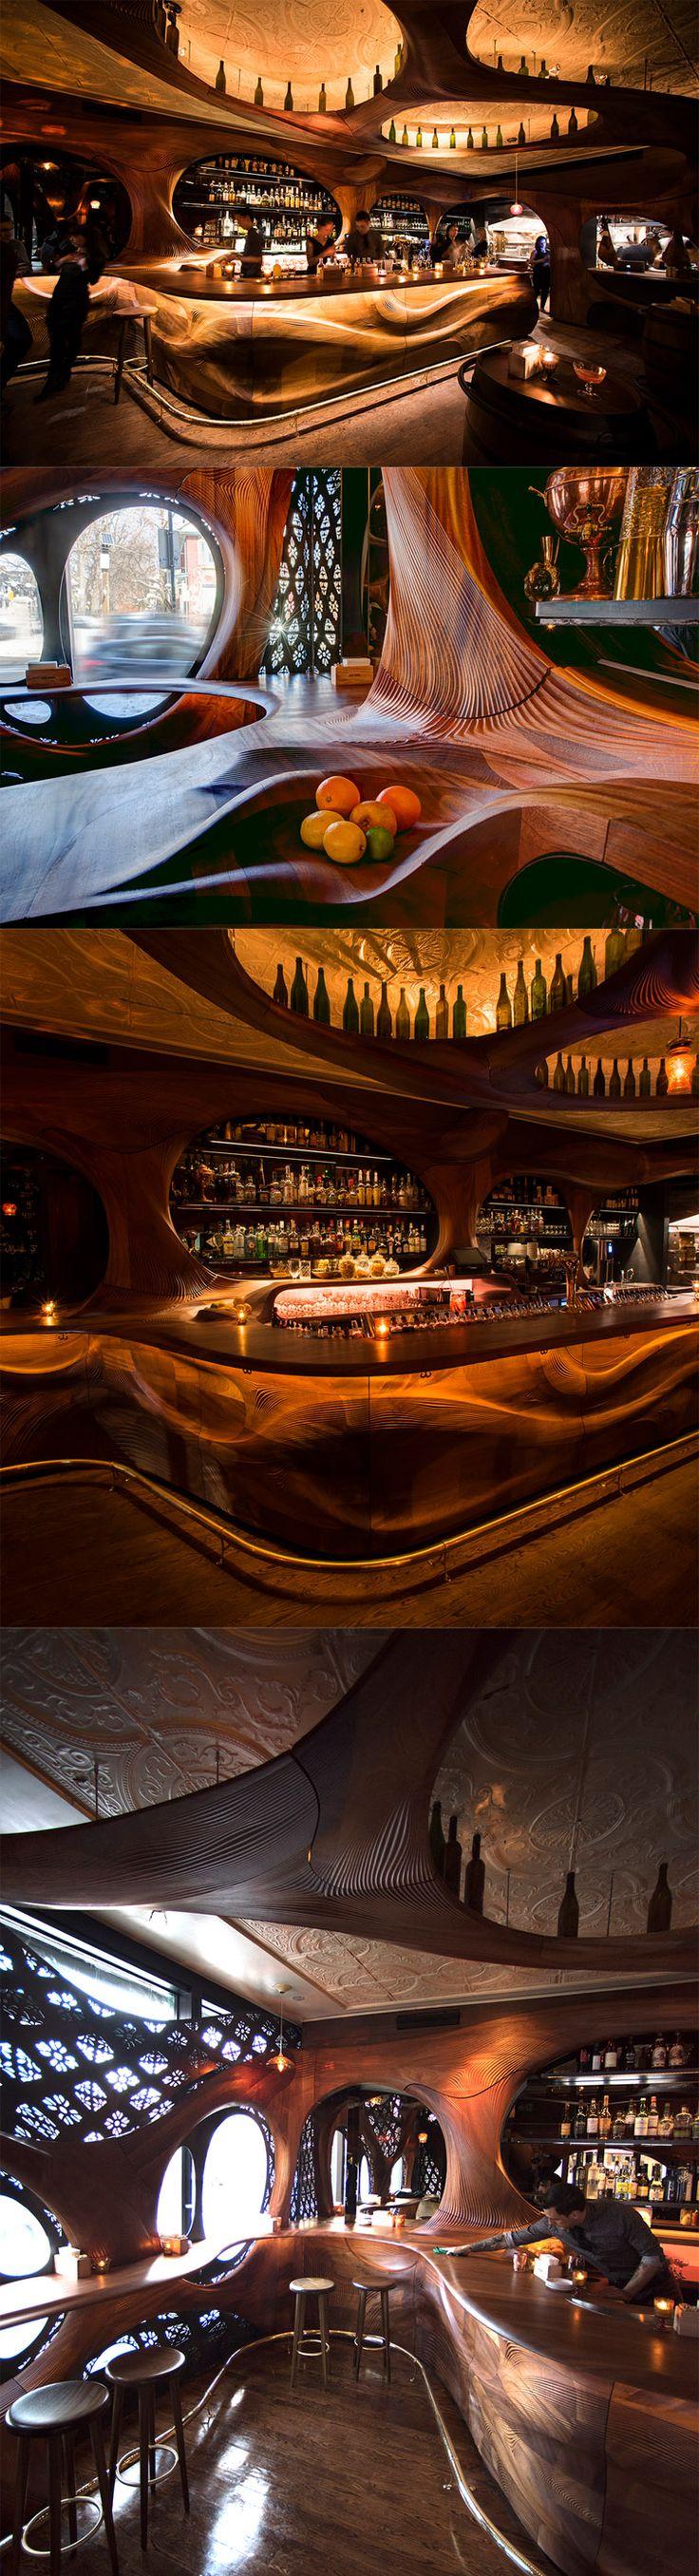 pintxo partisans revisits art nouveau with bar raval bar loungeinterior design - Interior Design Blog Ideas